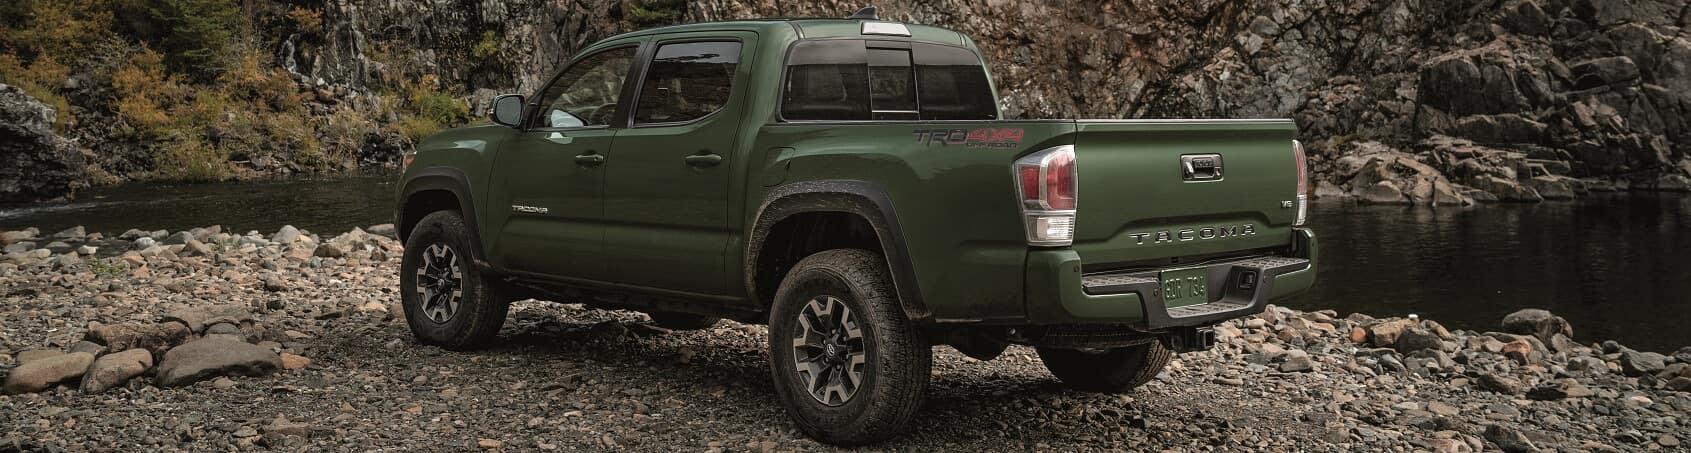 Toyota Tacoma Performance Specs